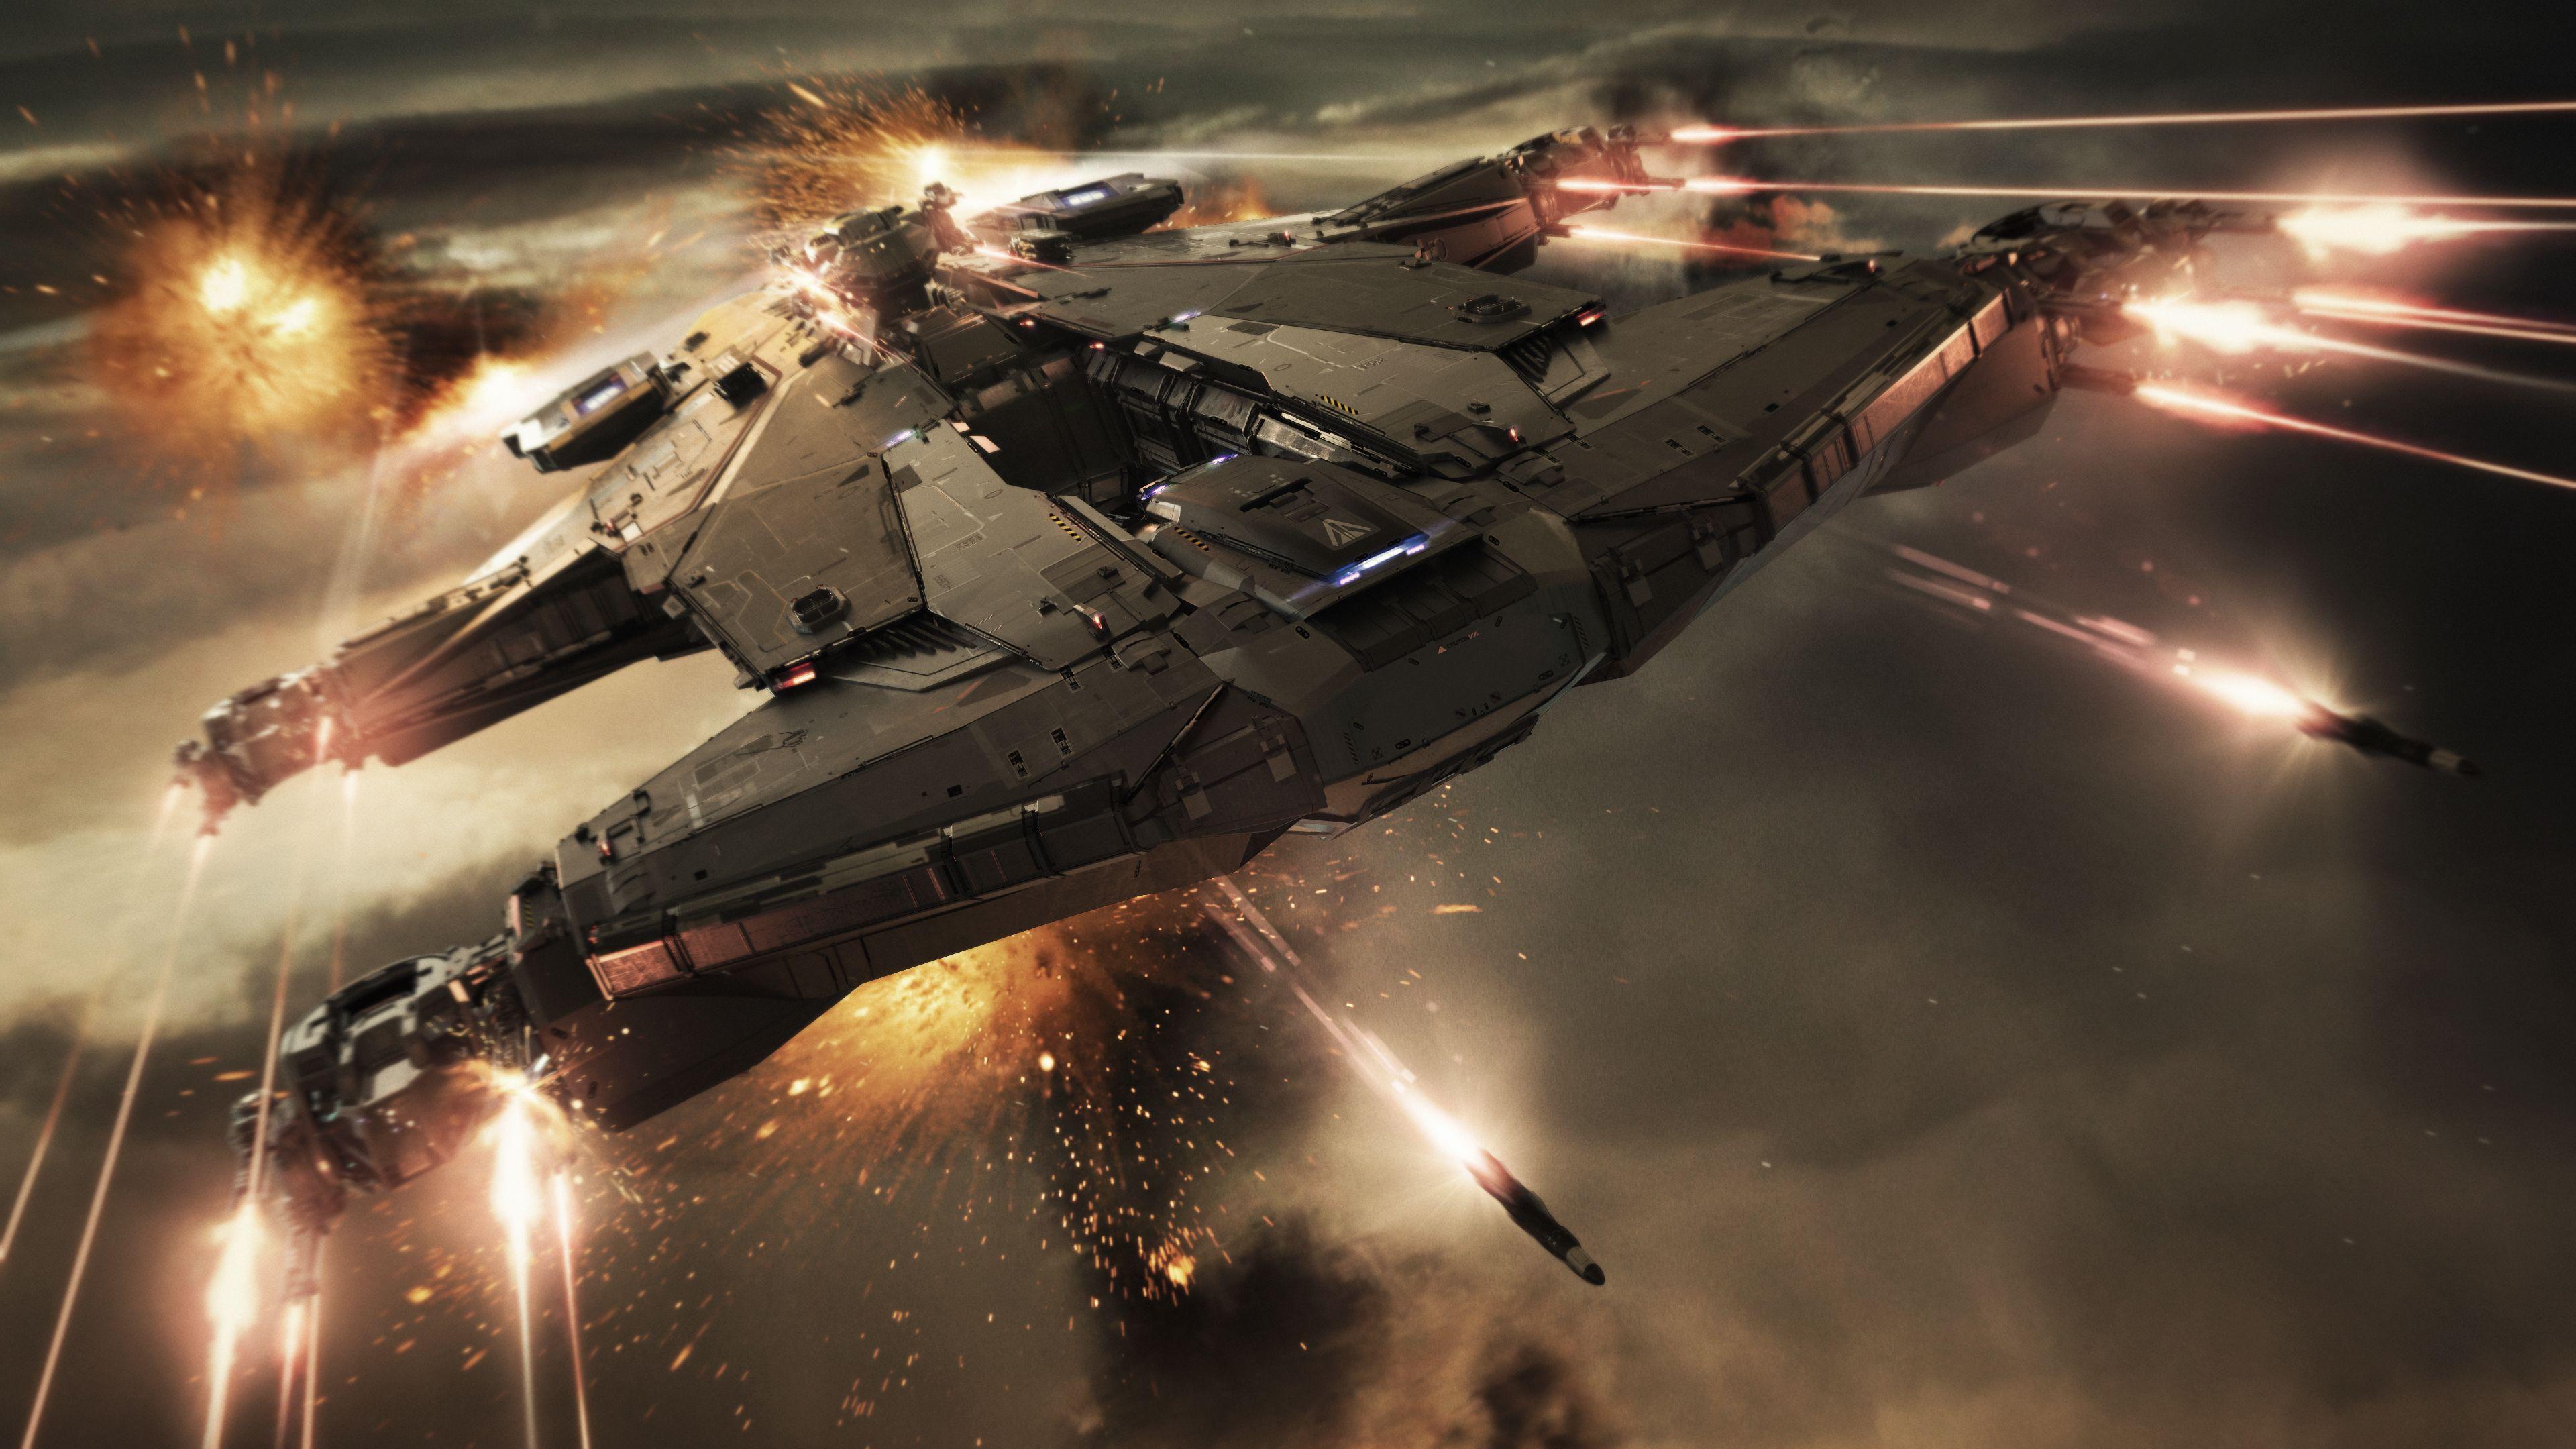 Hammerhead Combat Concept Jpg Star Citizen Spaceship Concept Concept Ships